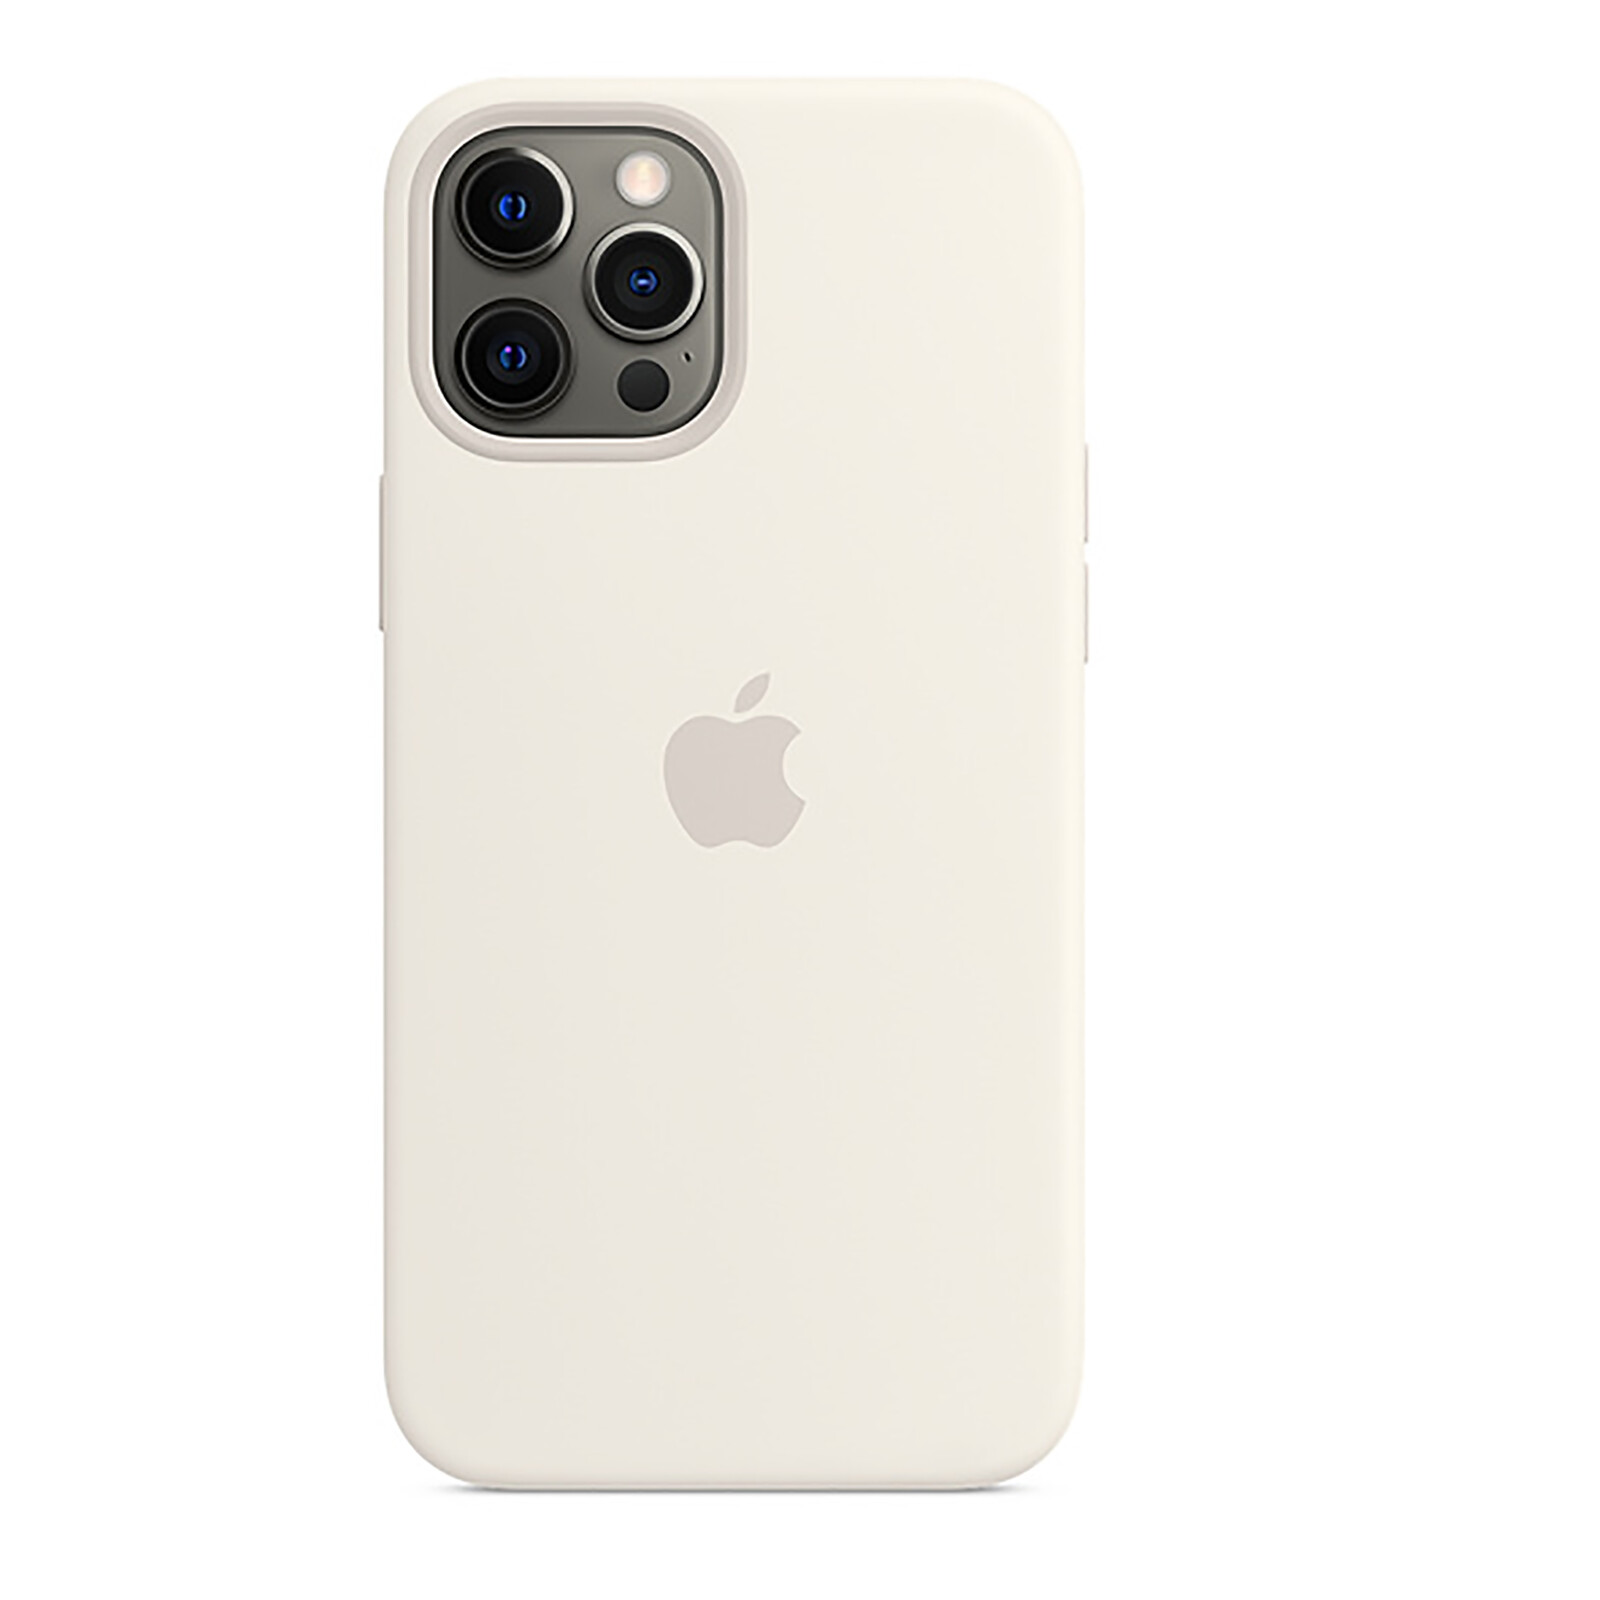 Apple iPhone 12 Pro Max Silikon Case mit MagSafe weiß